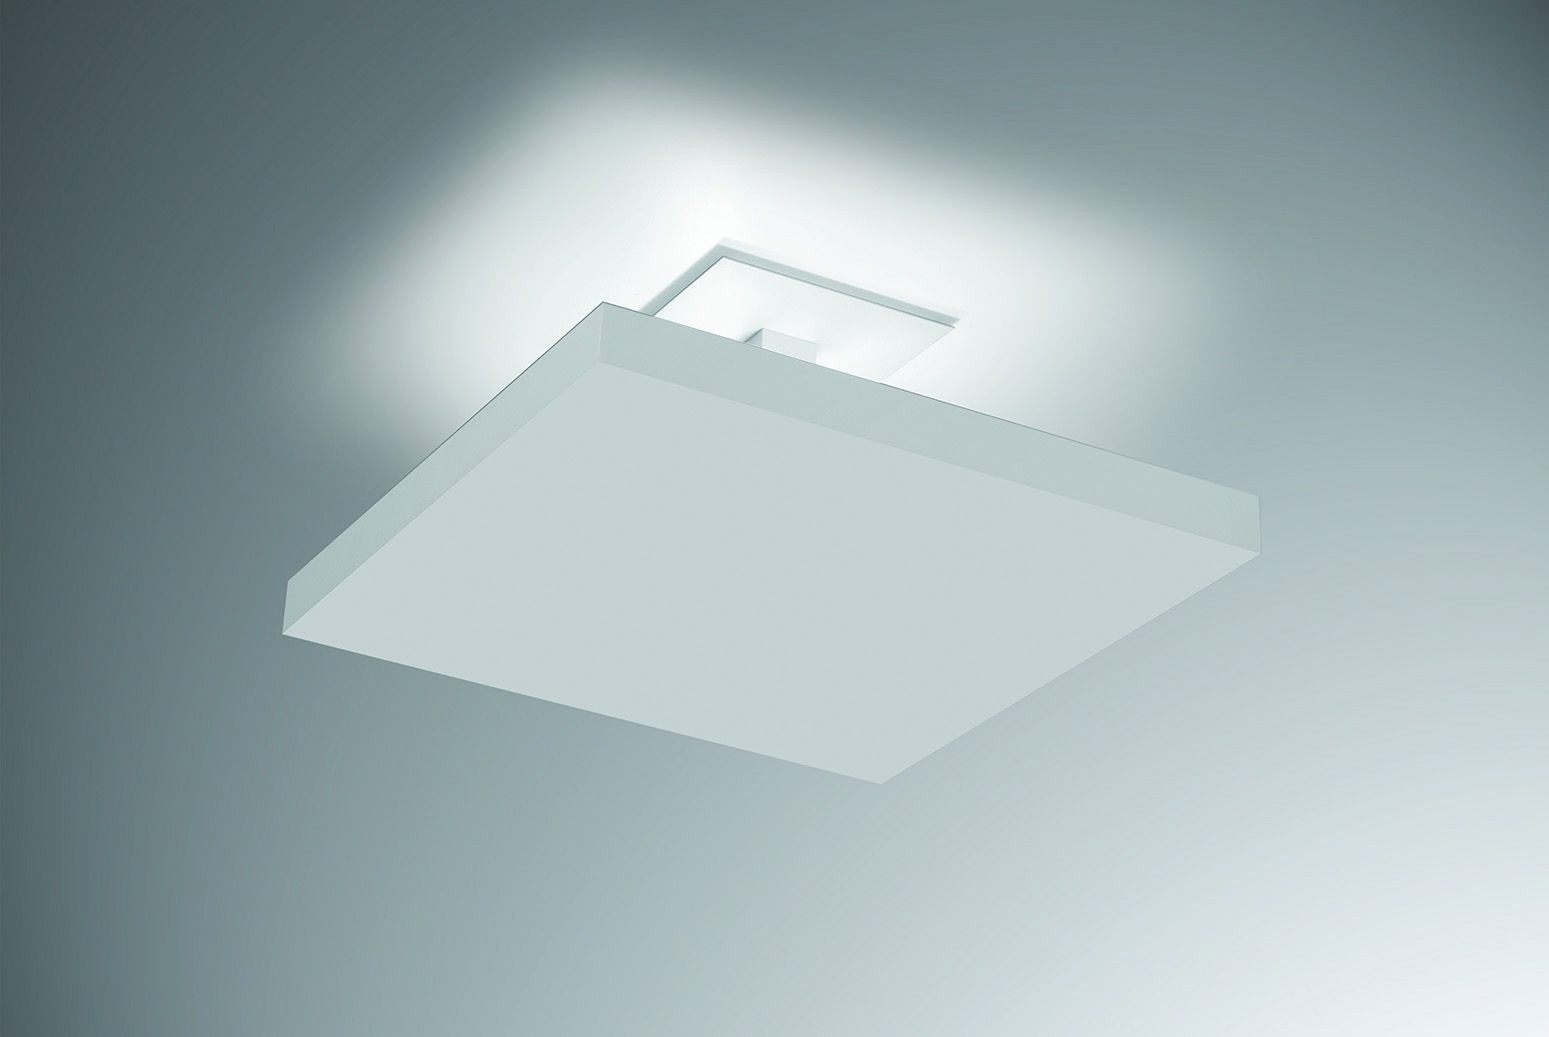 Plafon sobrepor de luz indireta 40x40cm em alumínio branco texturizado